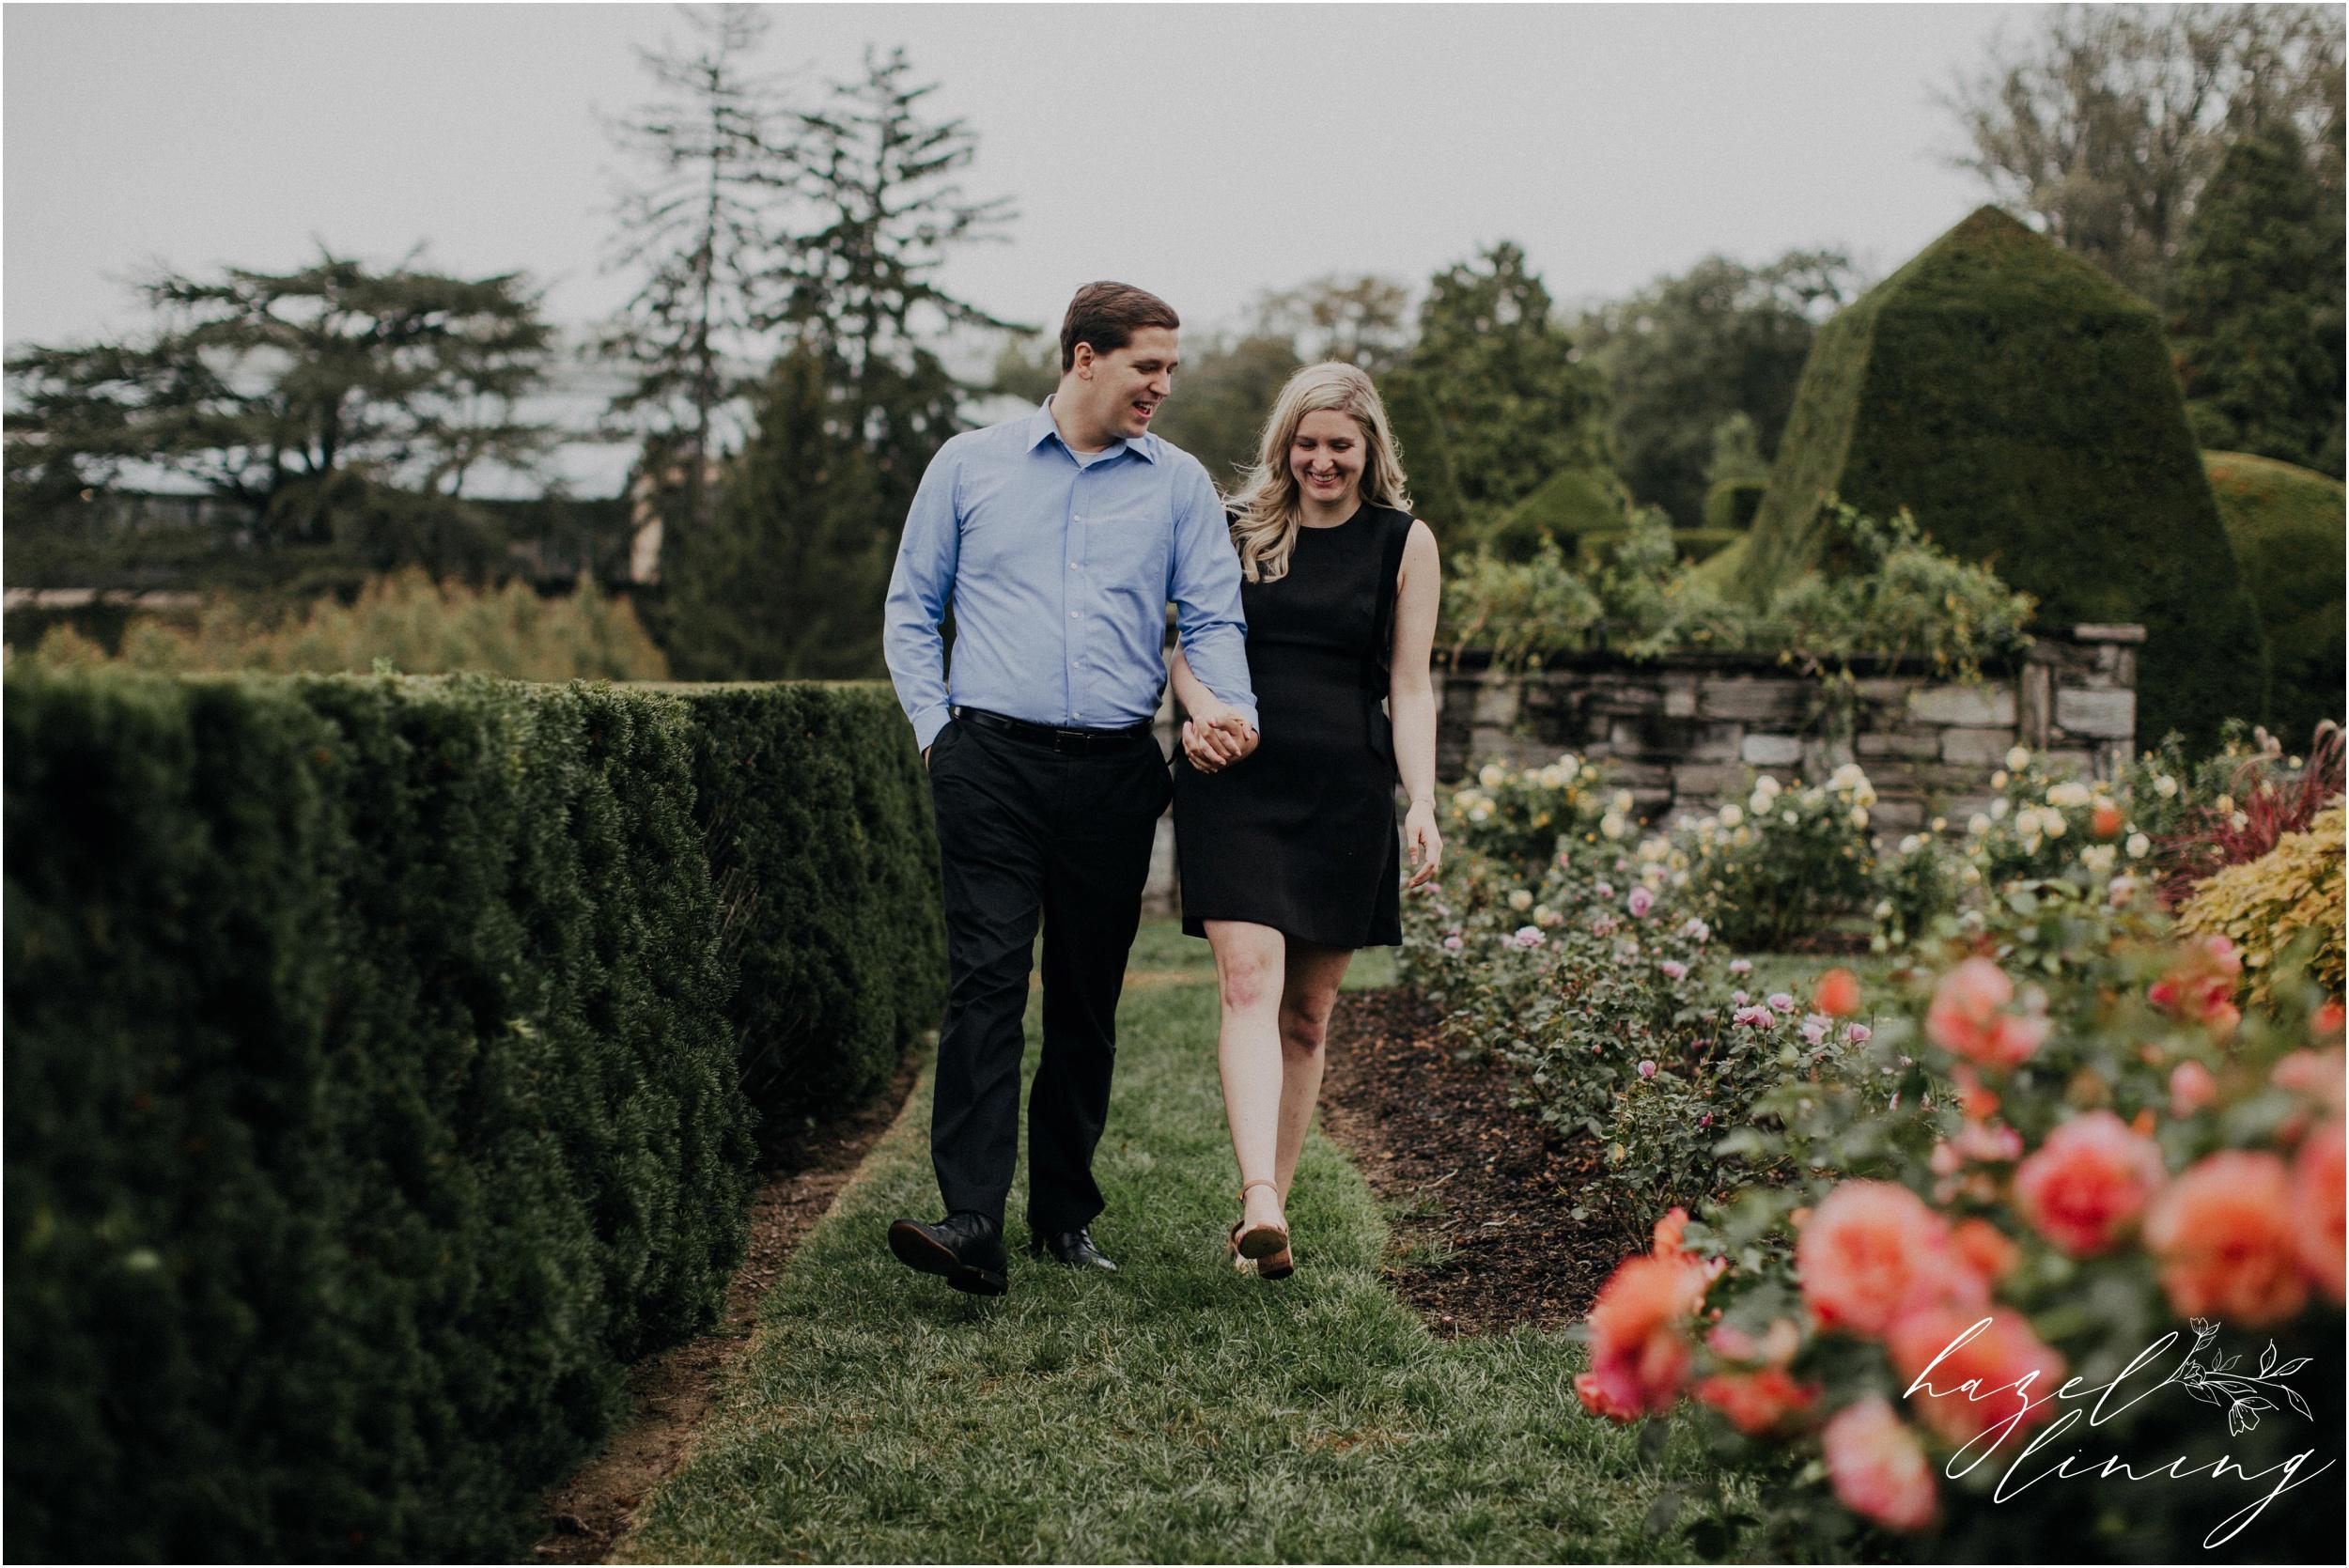 victoria-travis-logan-mayes-longwood-gardens-kennett-square-philadelphia-engagement-session-hazel-lining-photography-destination-elopement-wedding-engagement-photography_0013.jpg